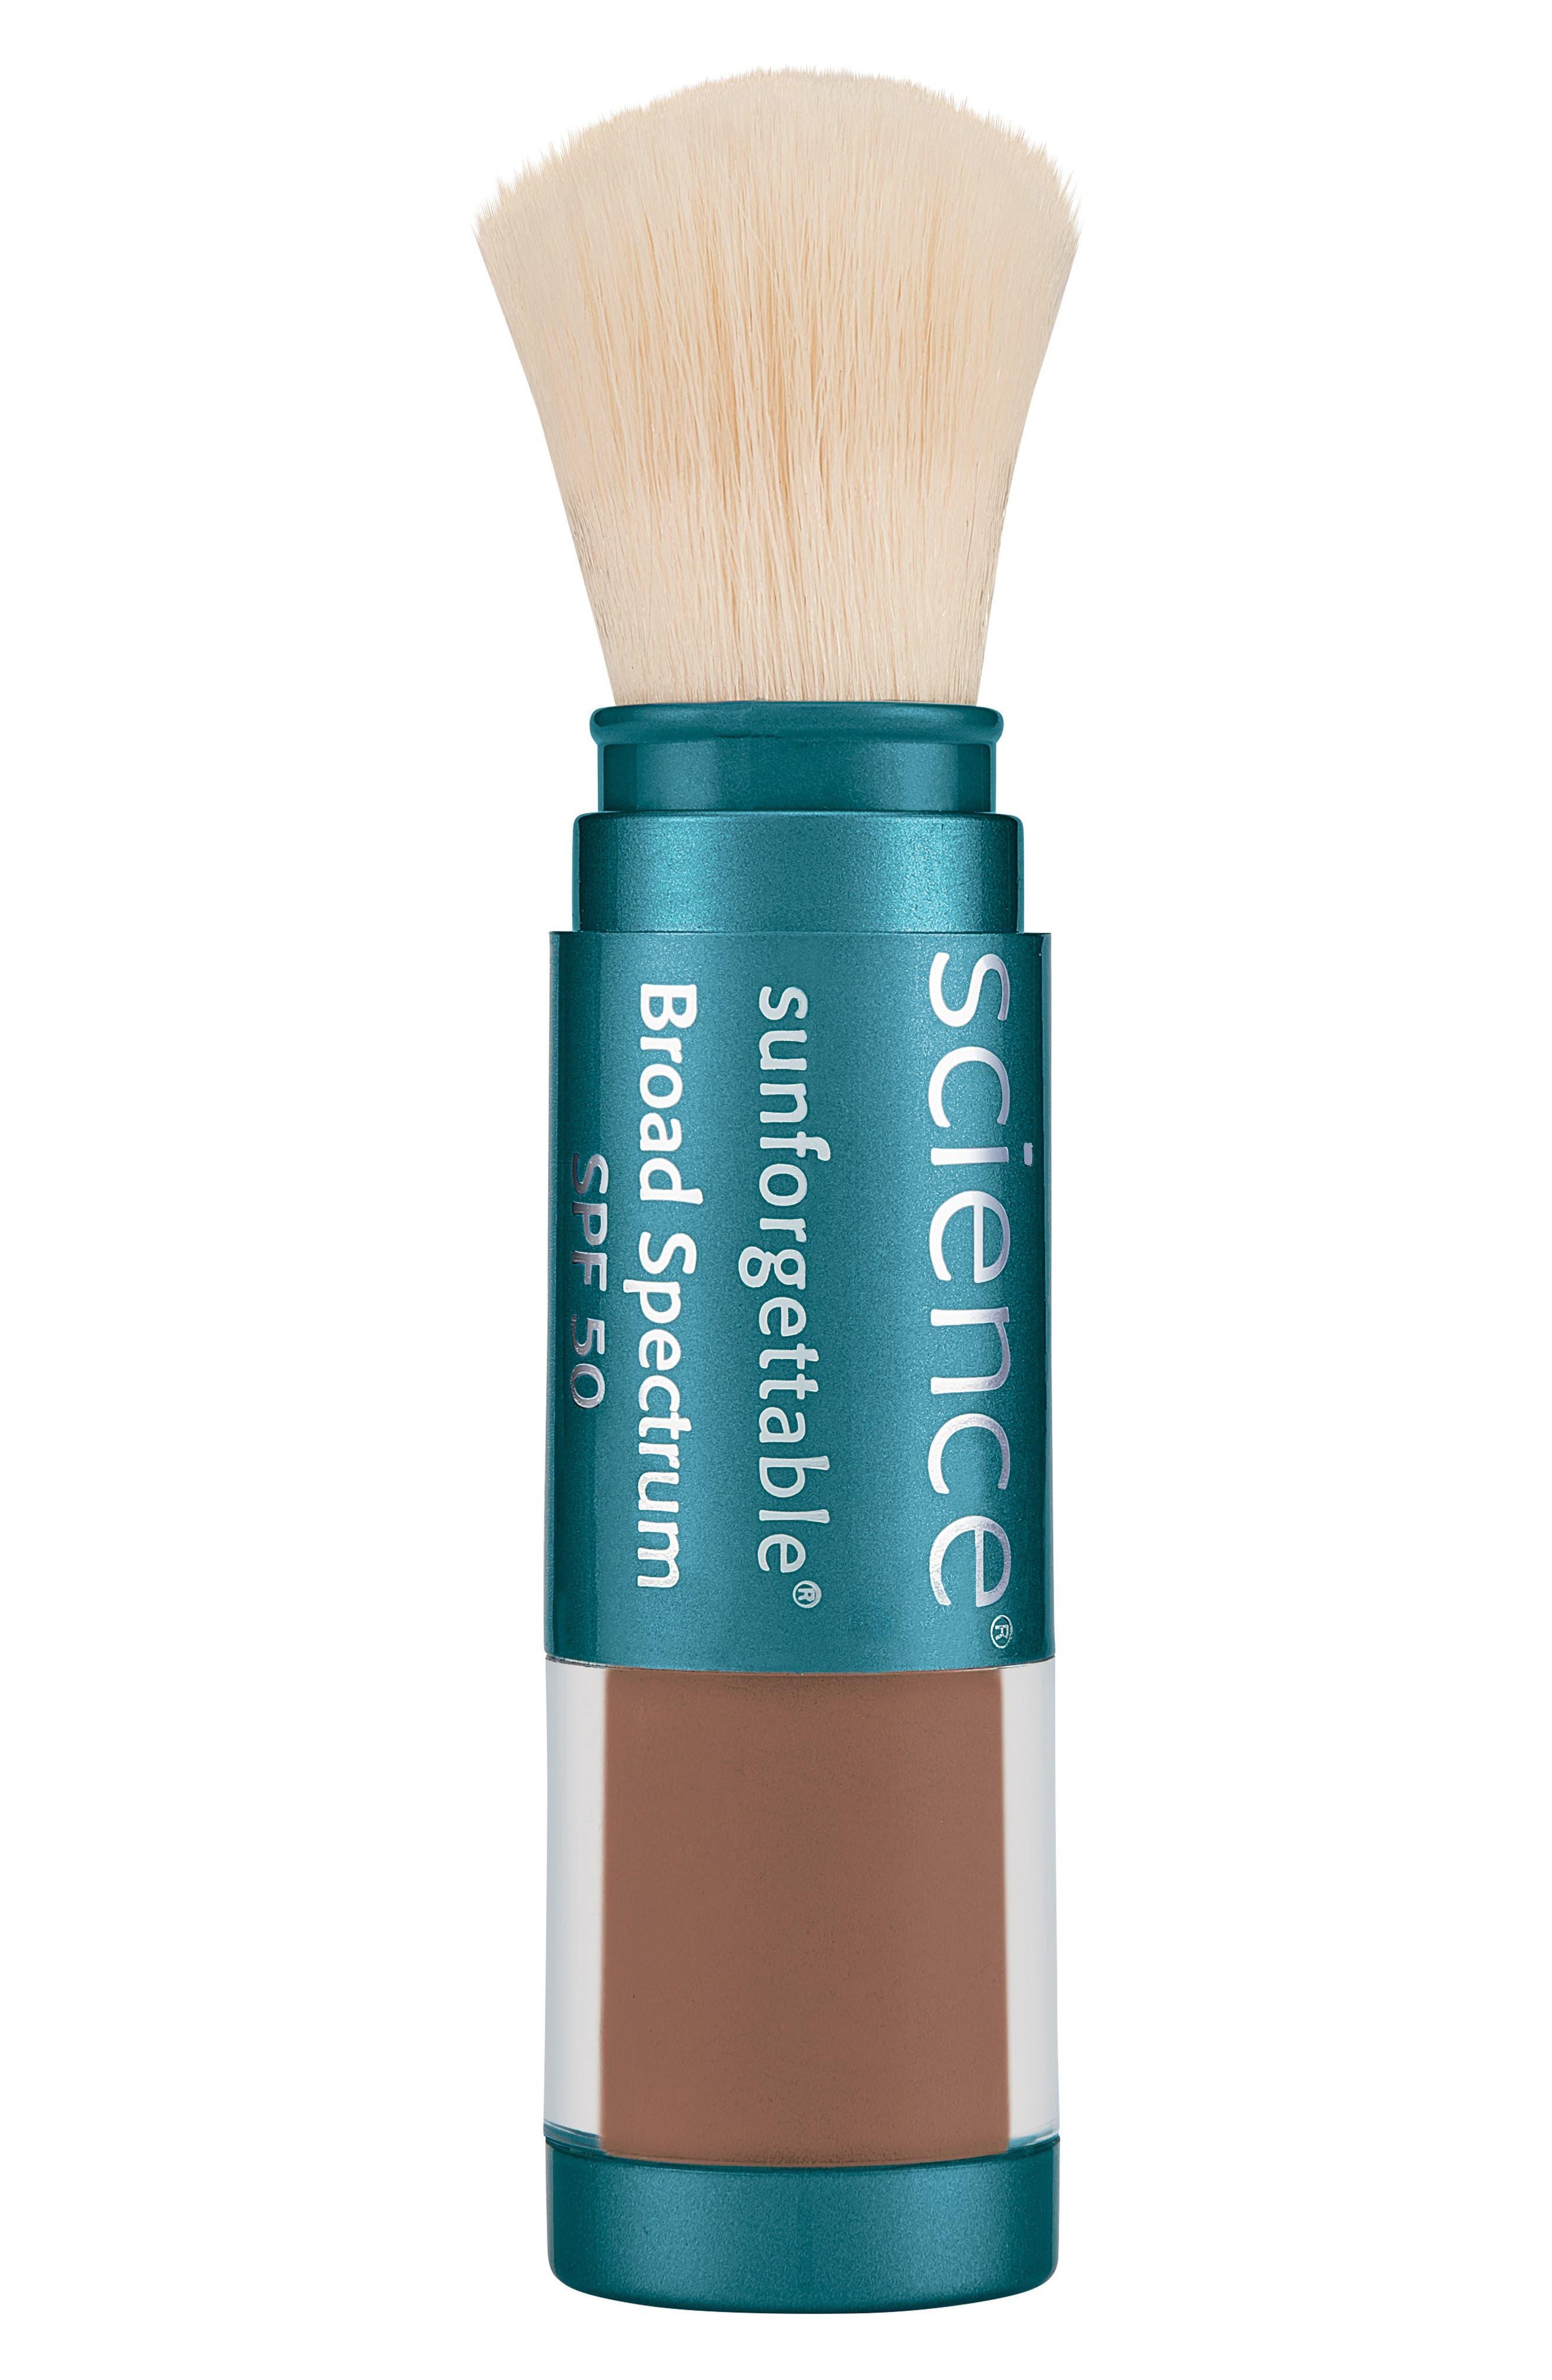 Colorescience® Sunforgettable® Brush-On Sunscreen SPF 50